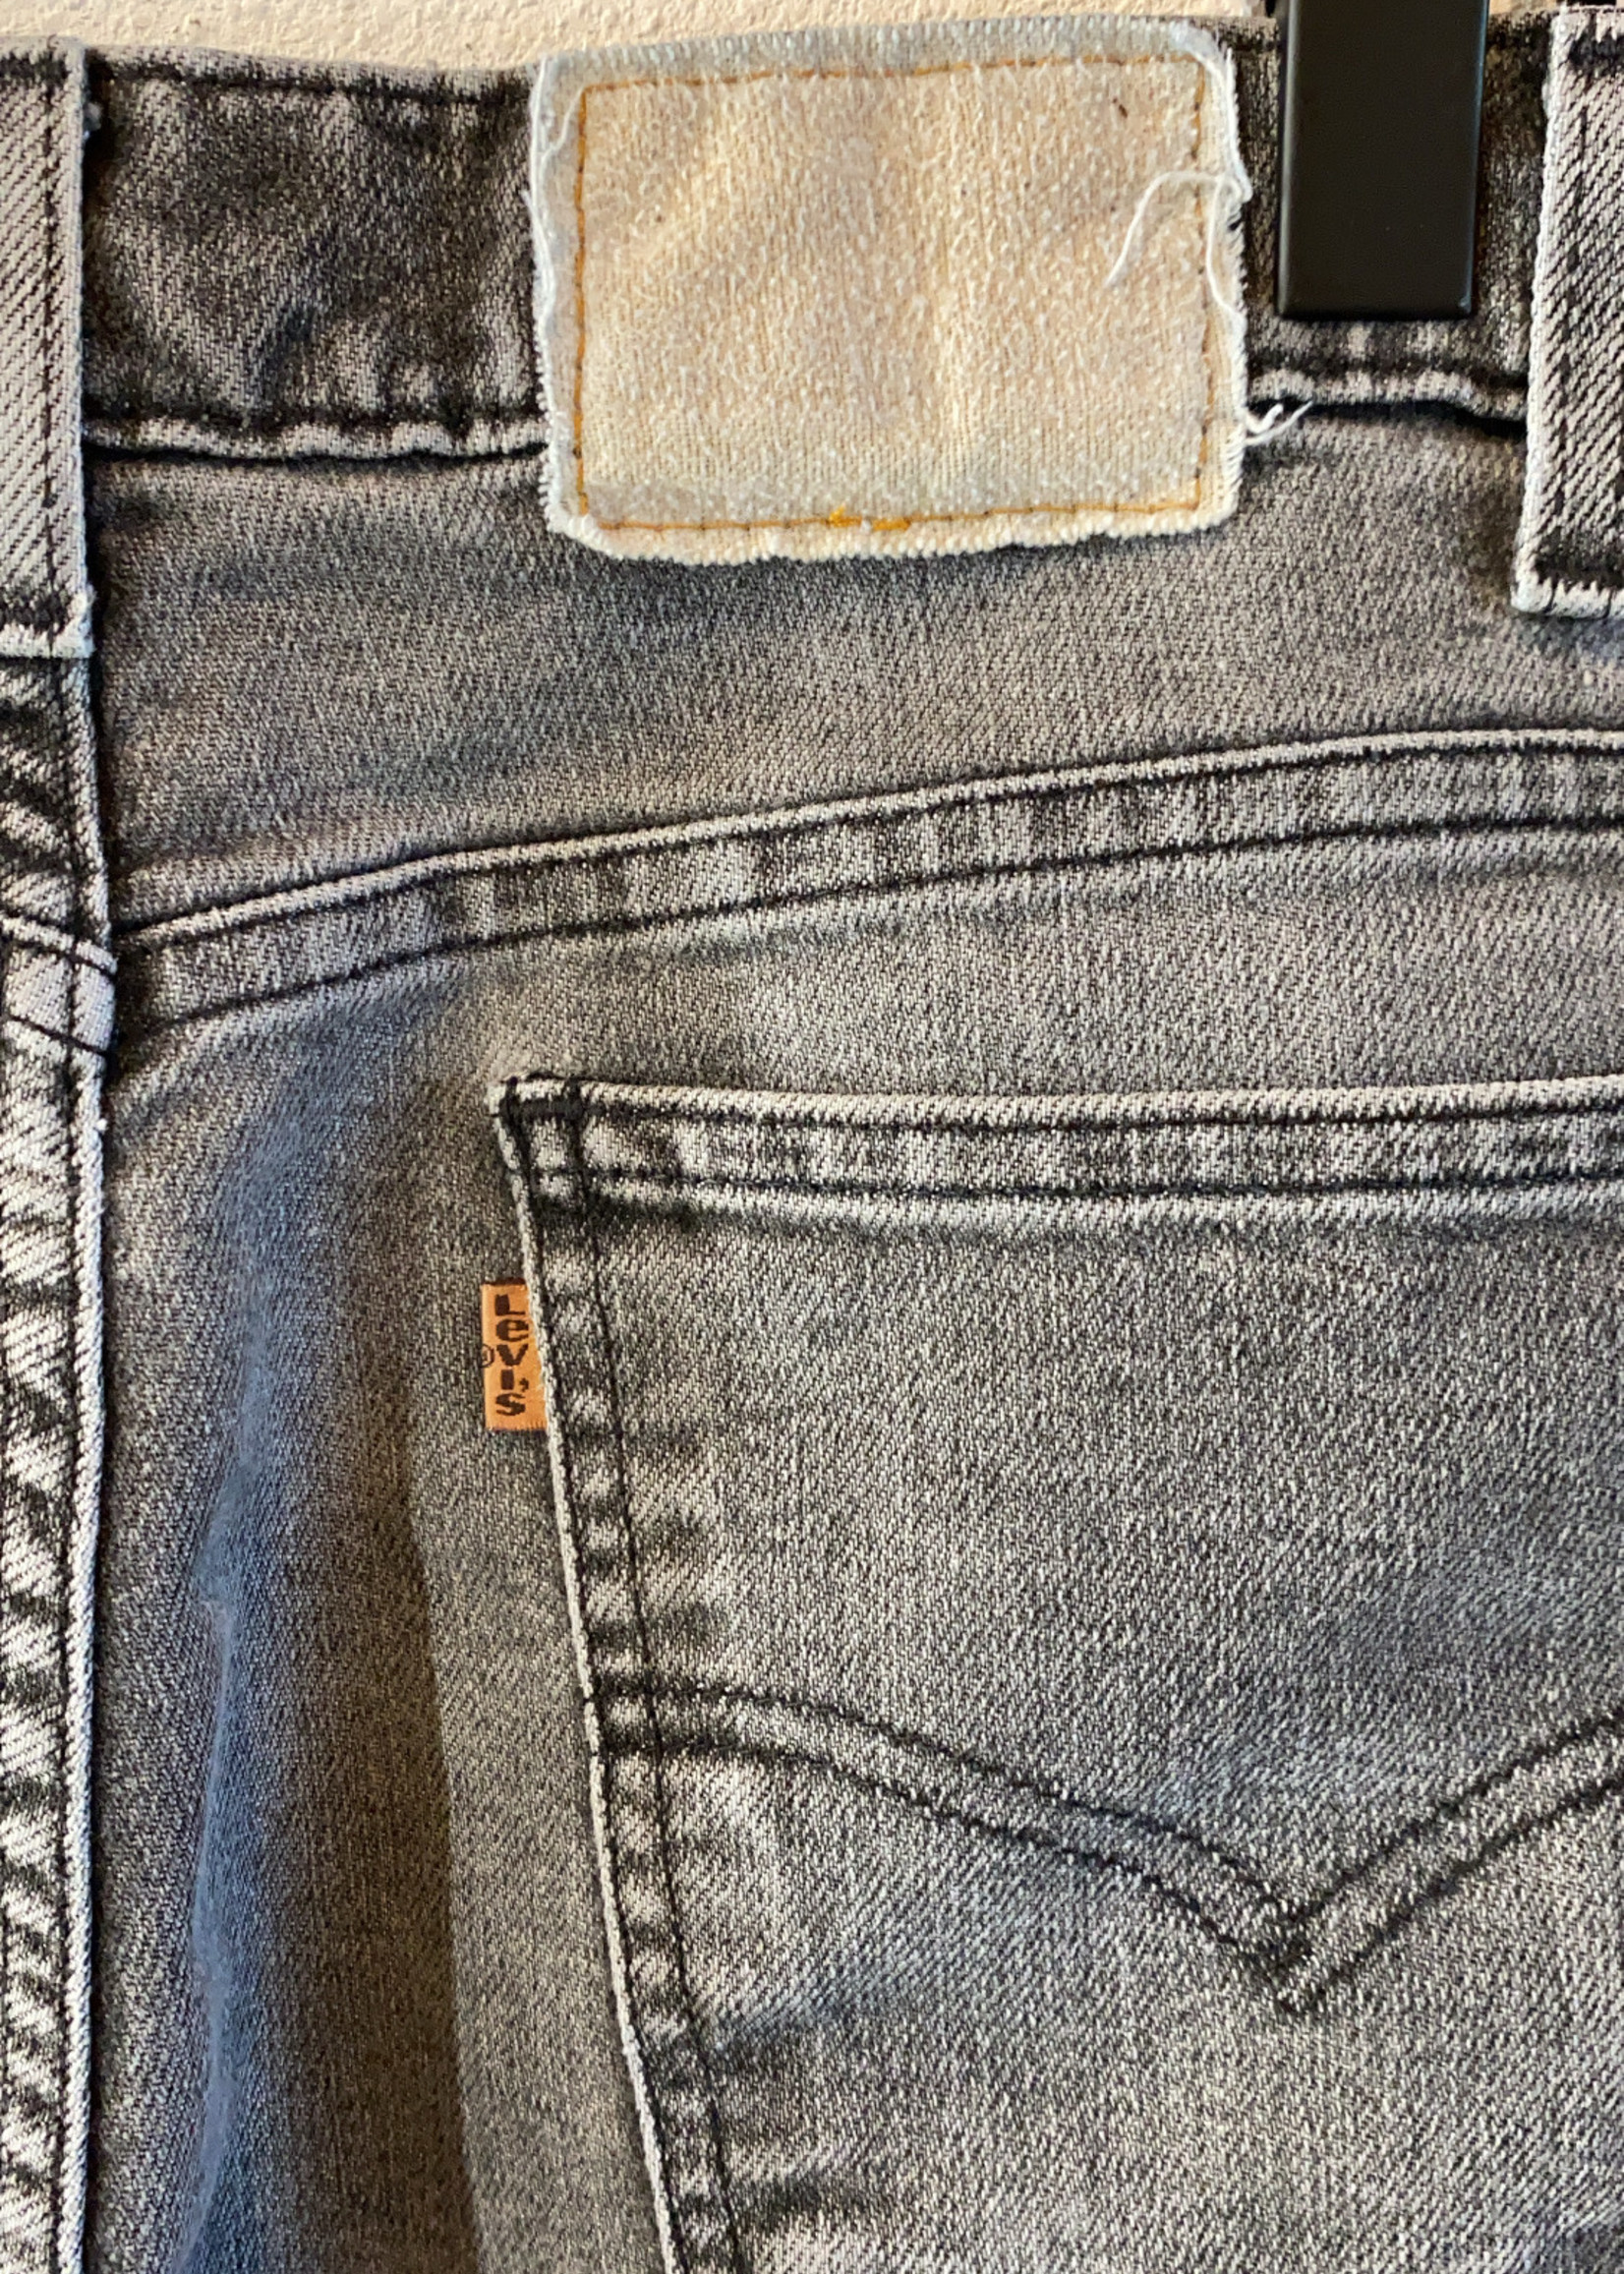 Vintage Levis 1989 faded black jeans 38x29